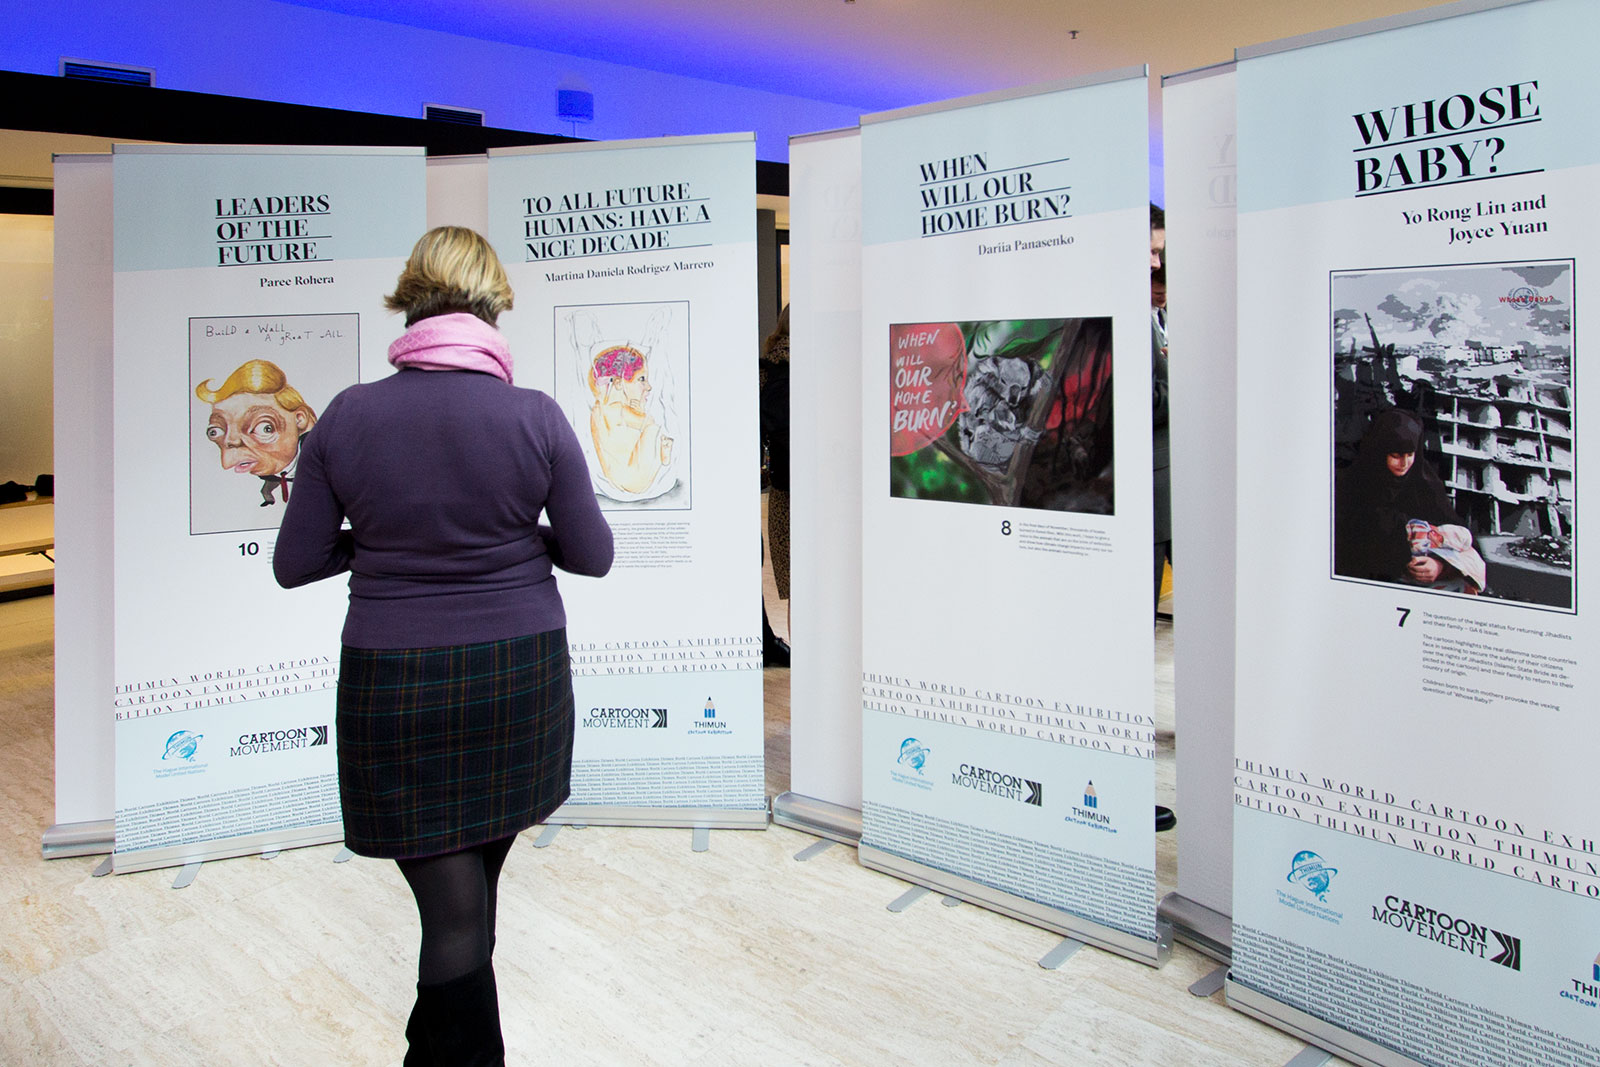 Thimun World Cartoon Exhibition